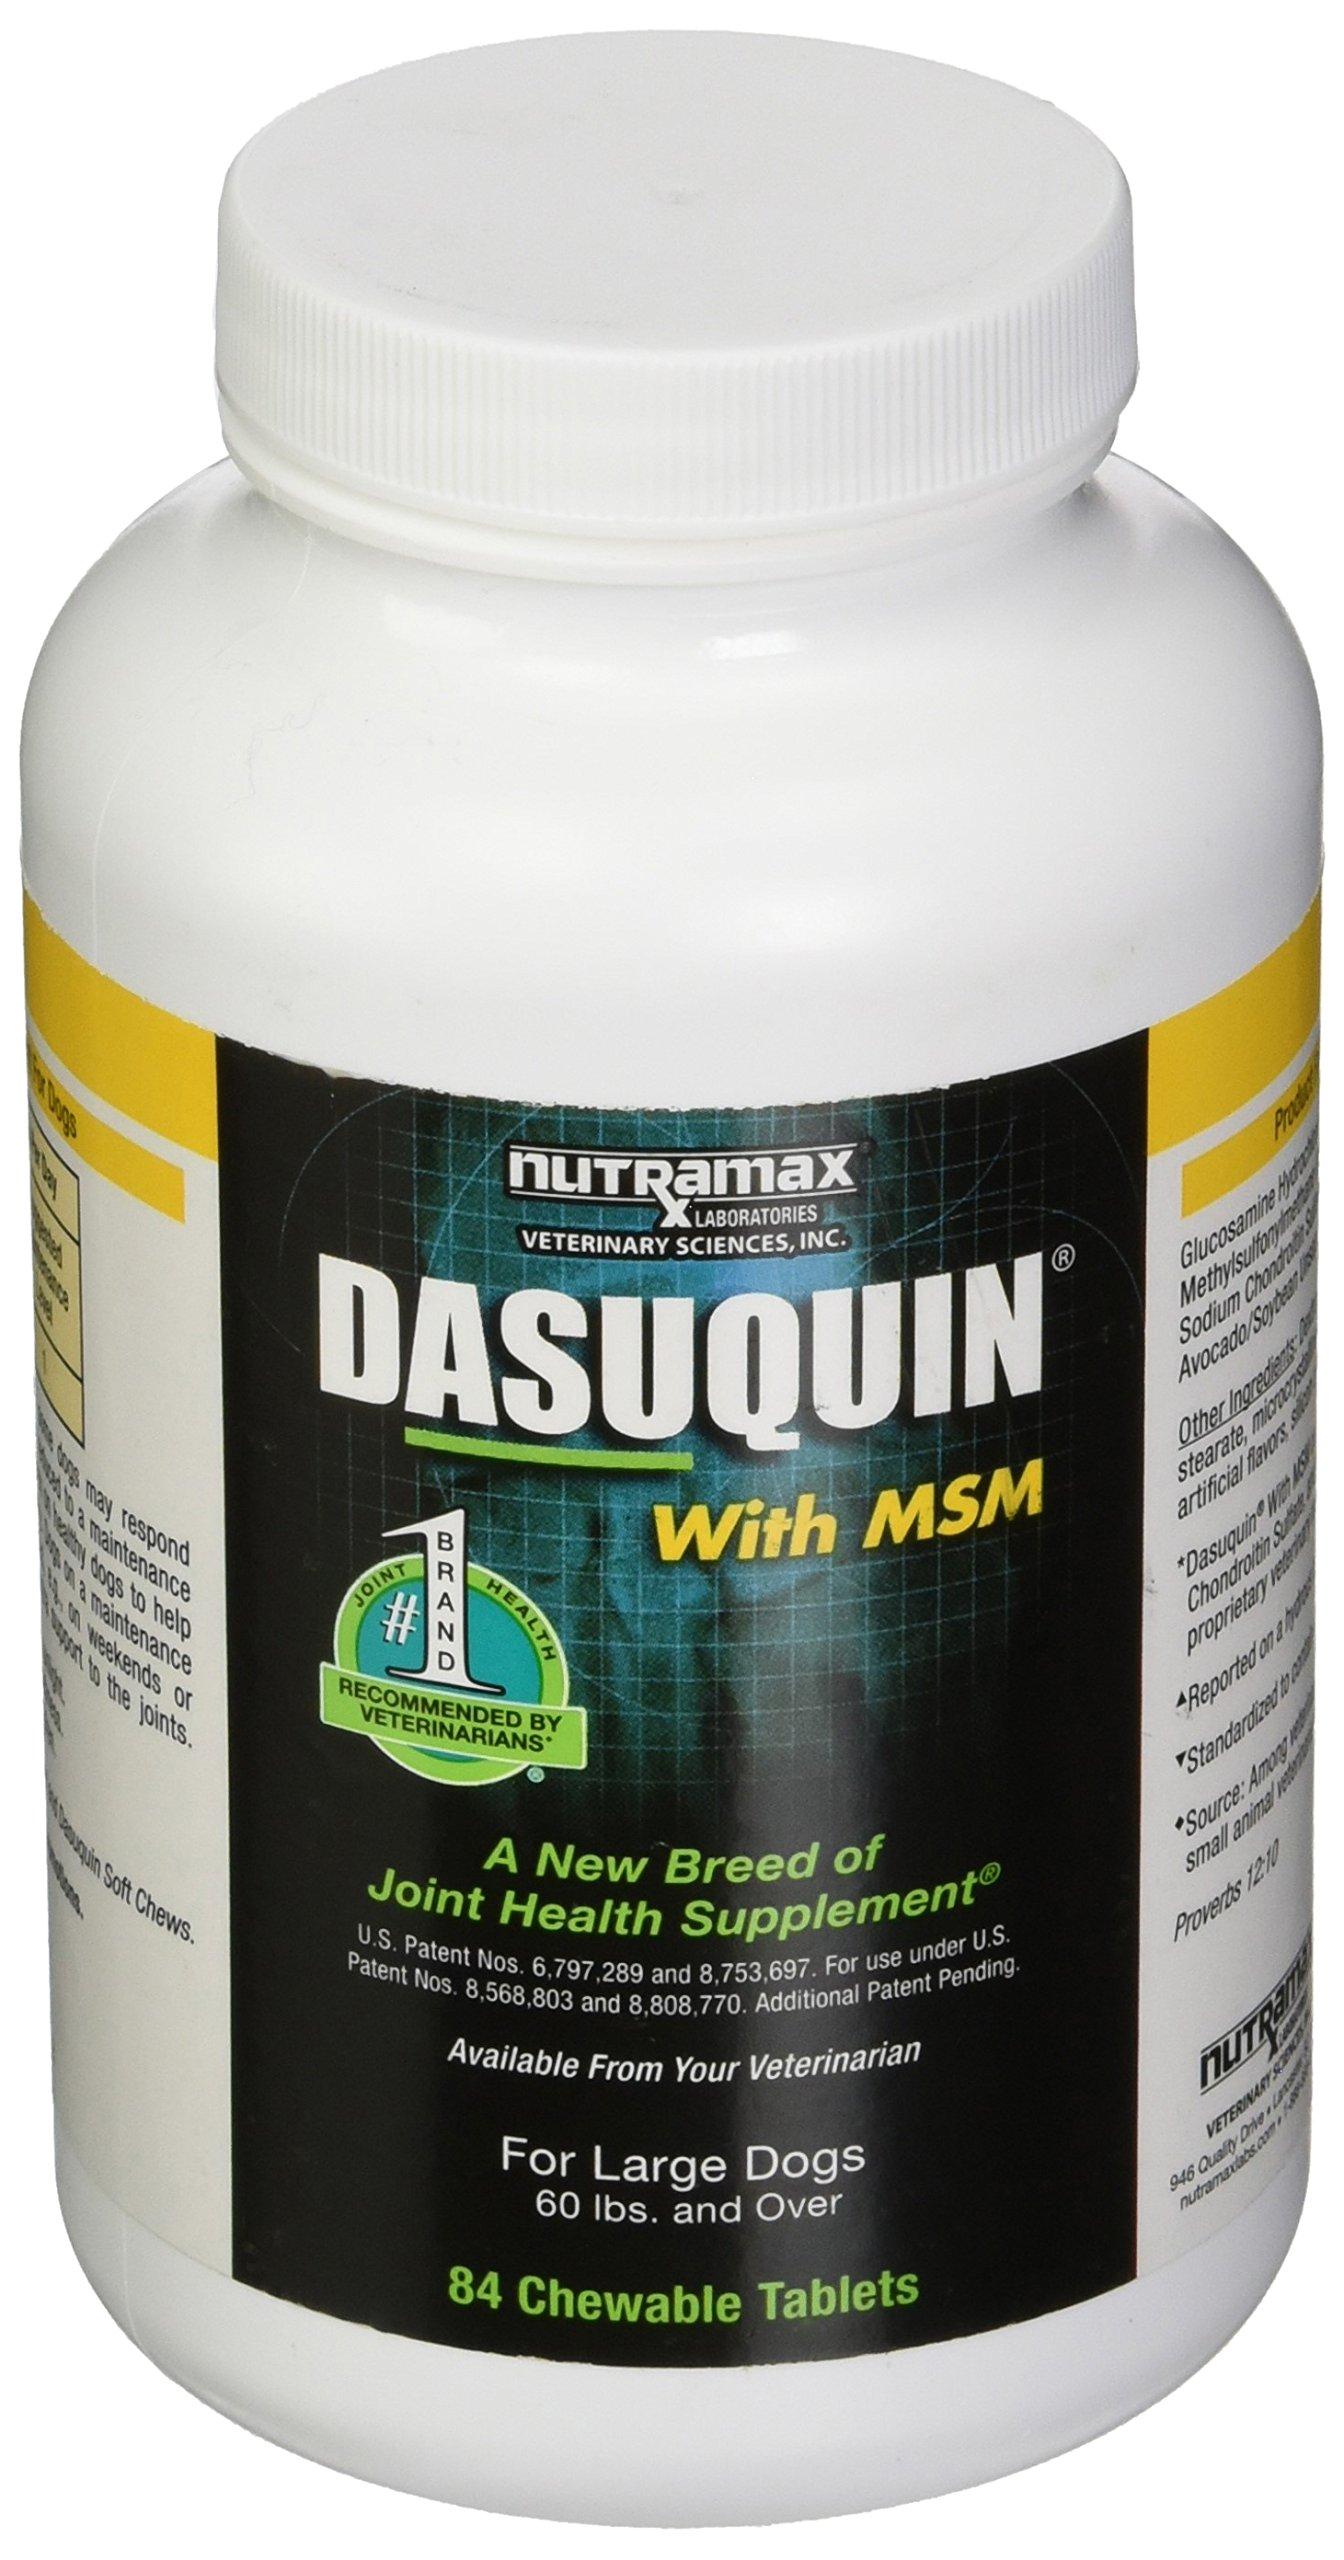 Nutramax Laboratories Dasuquin MSM Chewable Tablets for Large Dogs 84ct by Nutramax Laboratories